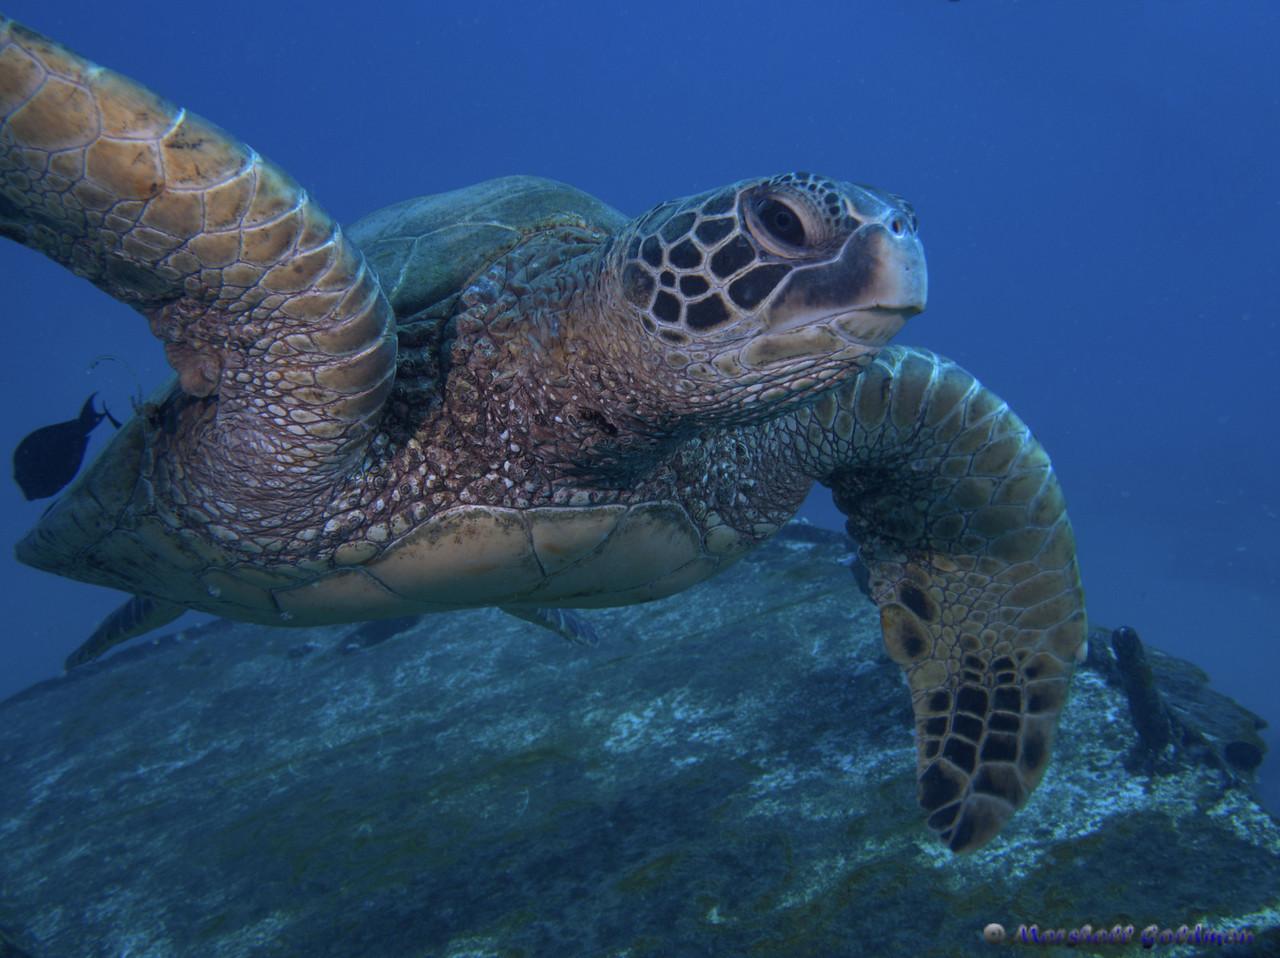 Hawaiian Green Turtle on St Anthonys Wreck II